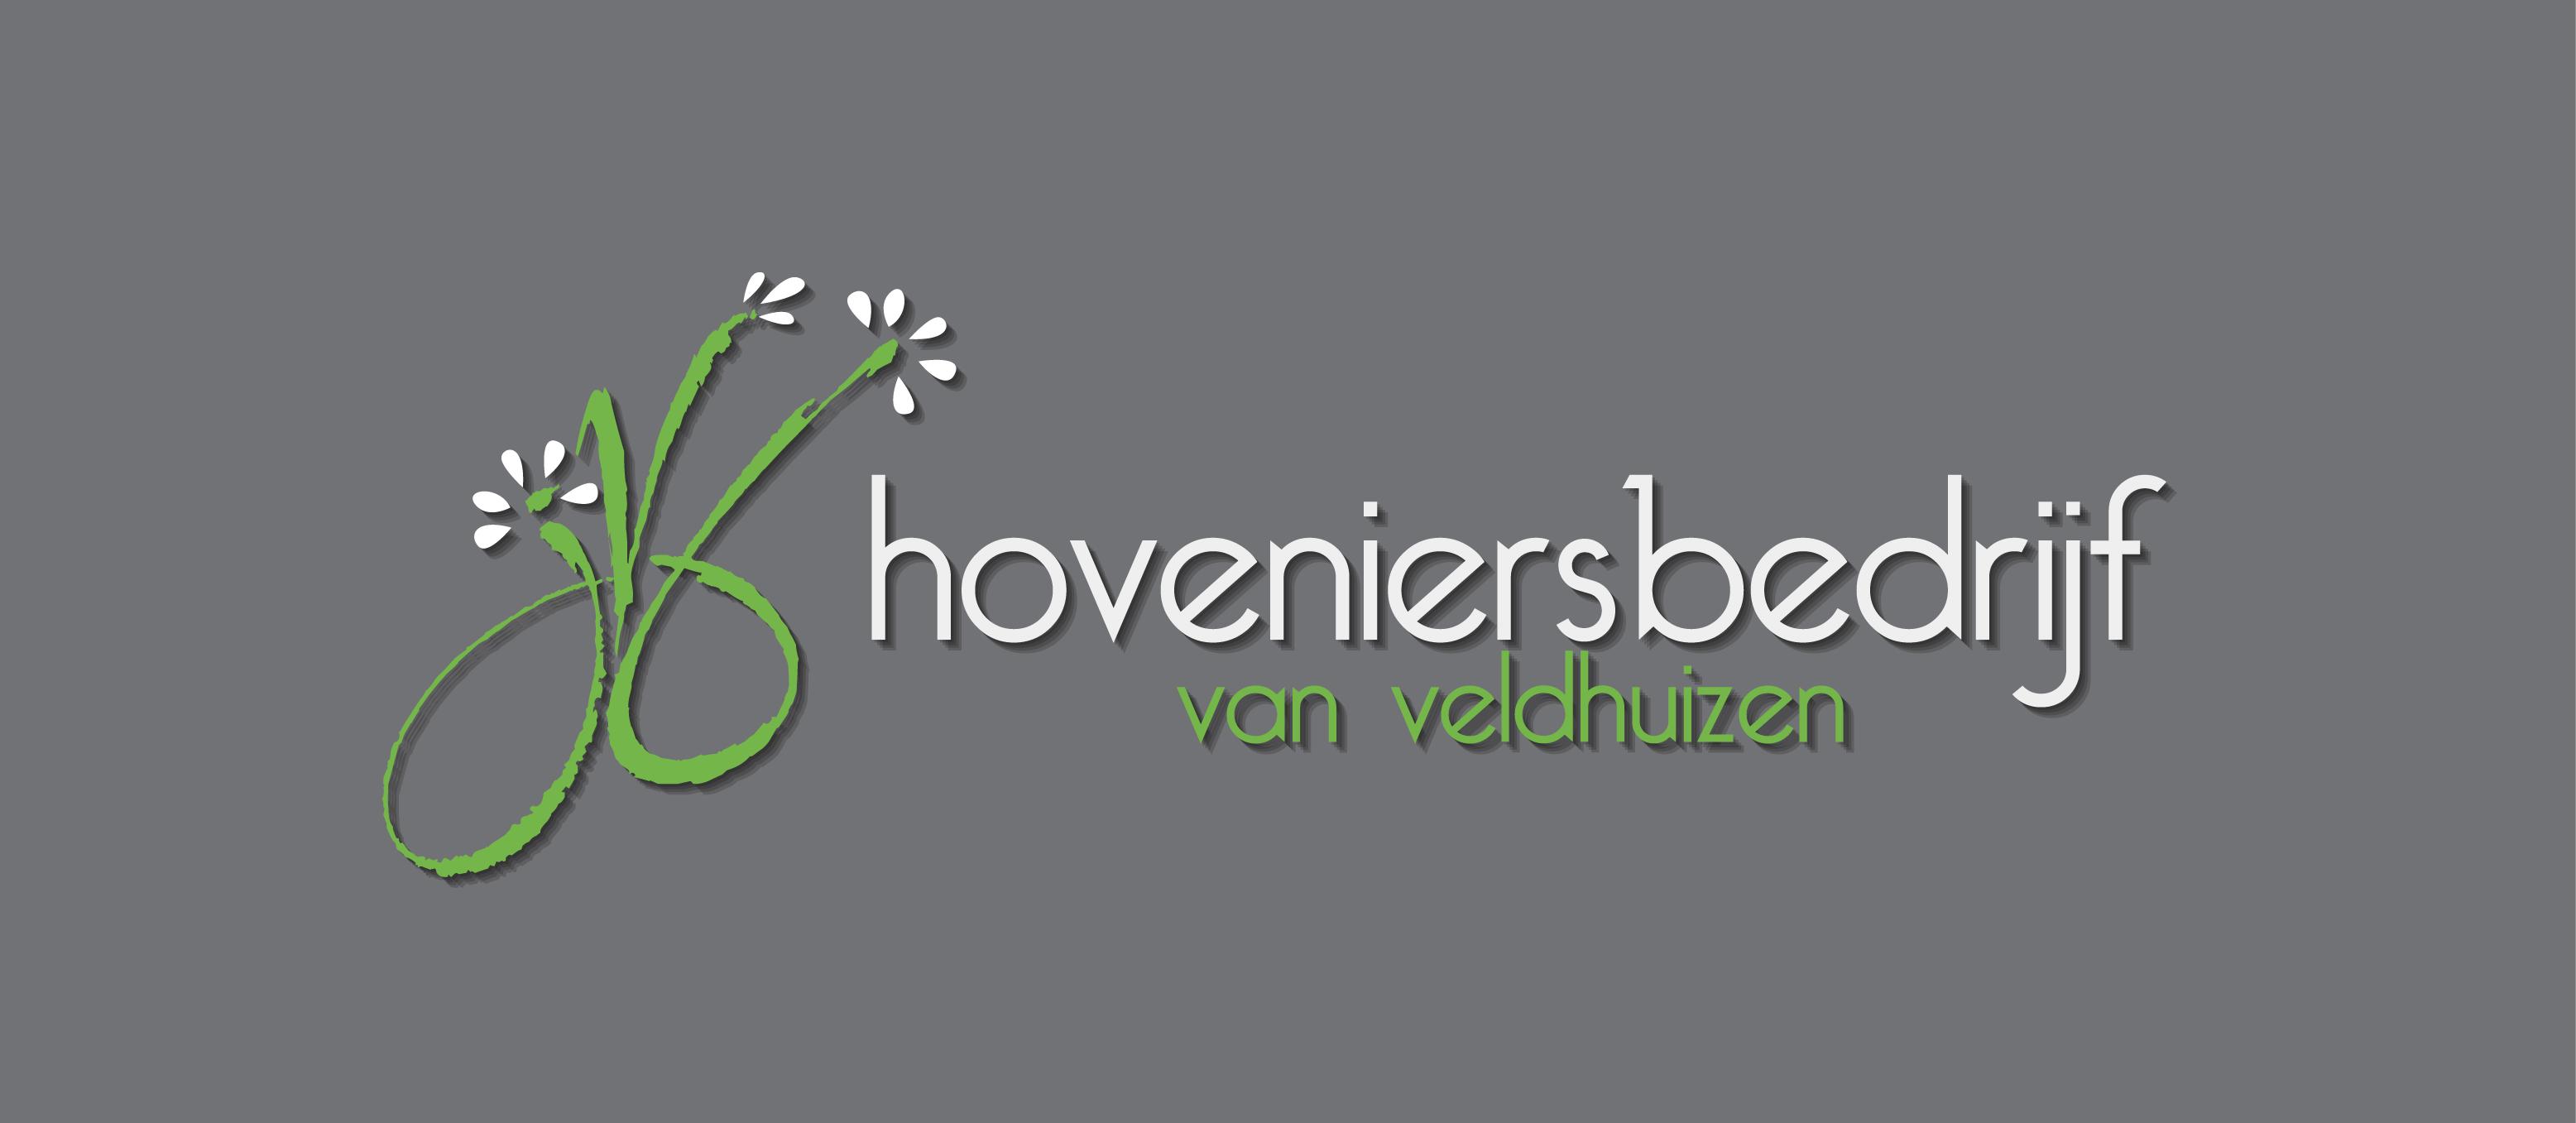 hoveniersbedrijf logo